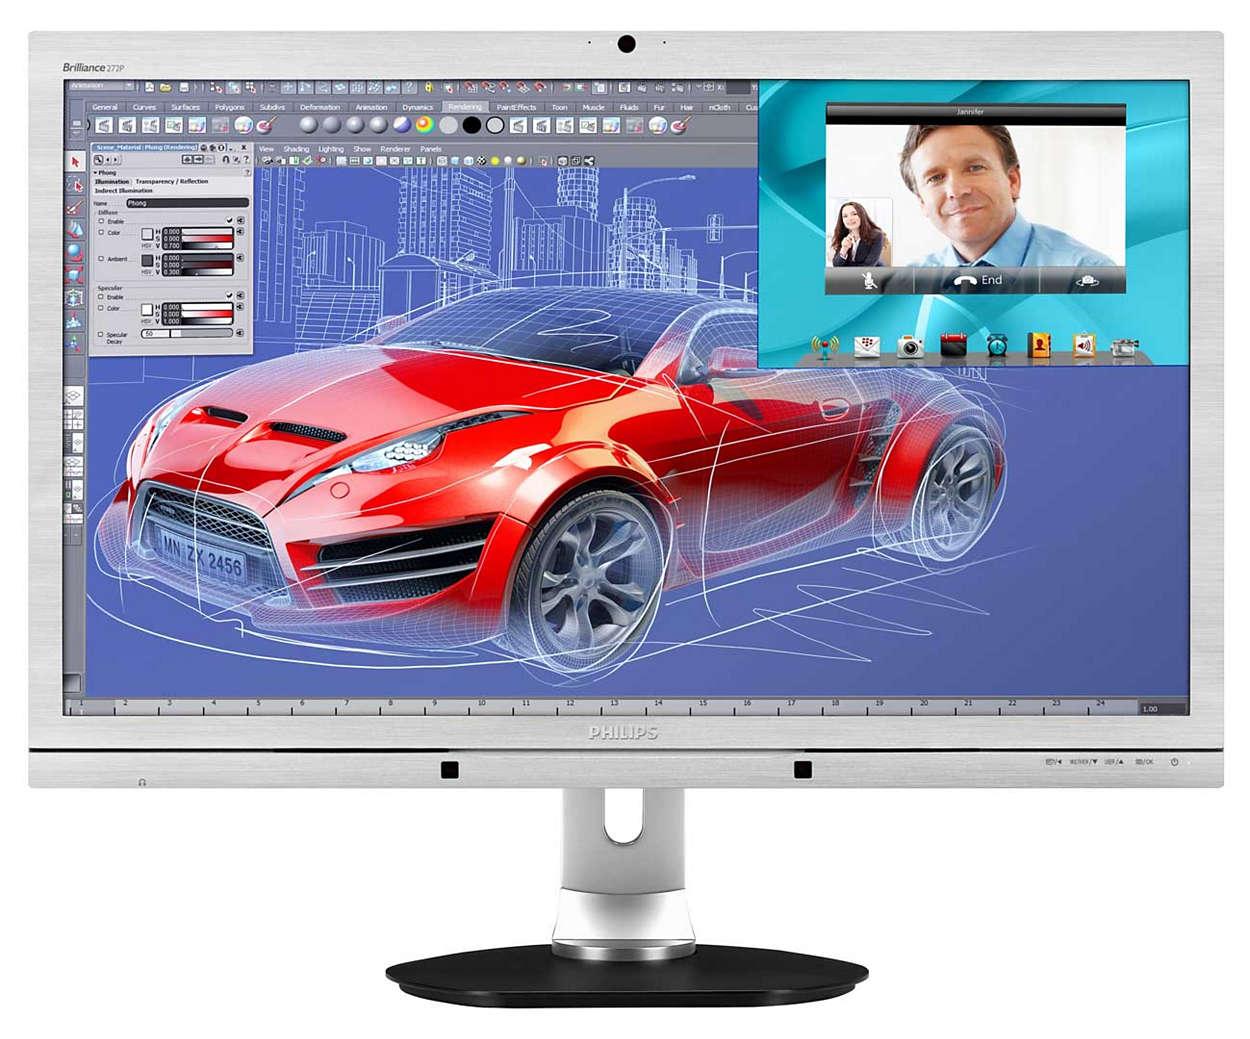 Imagens CrystalClear, produtividade máxima